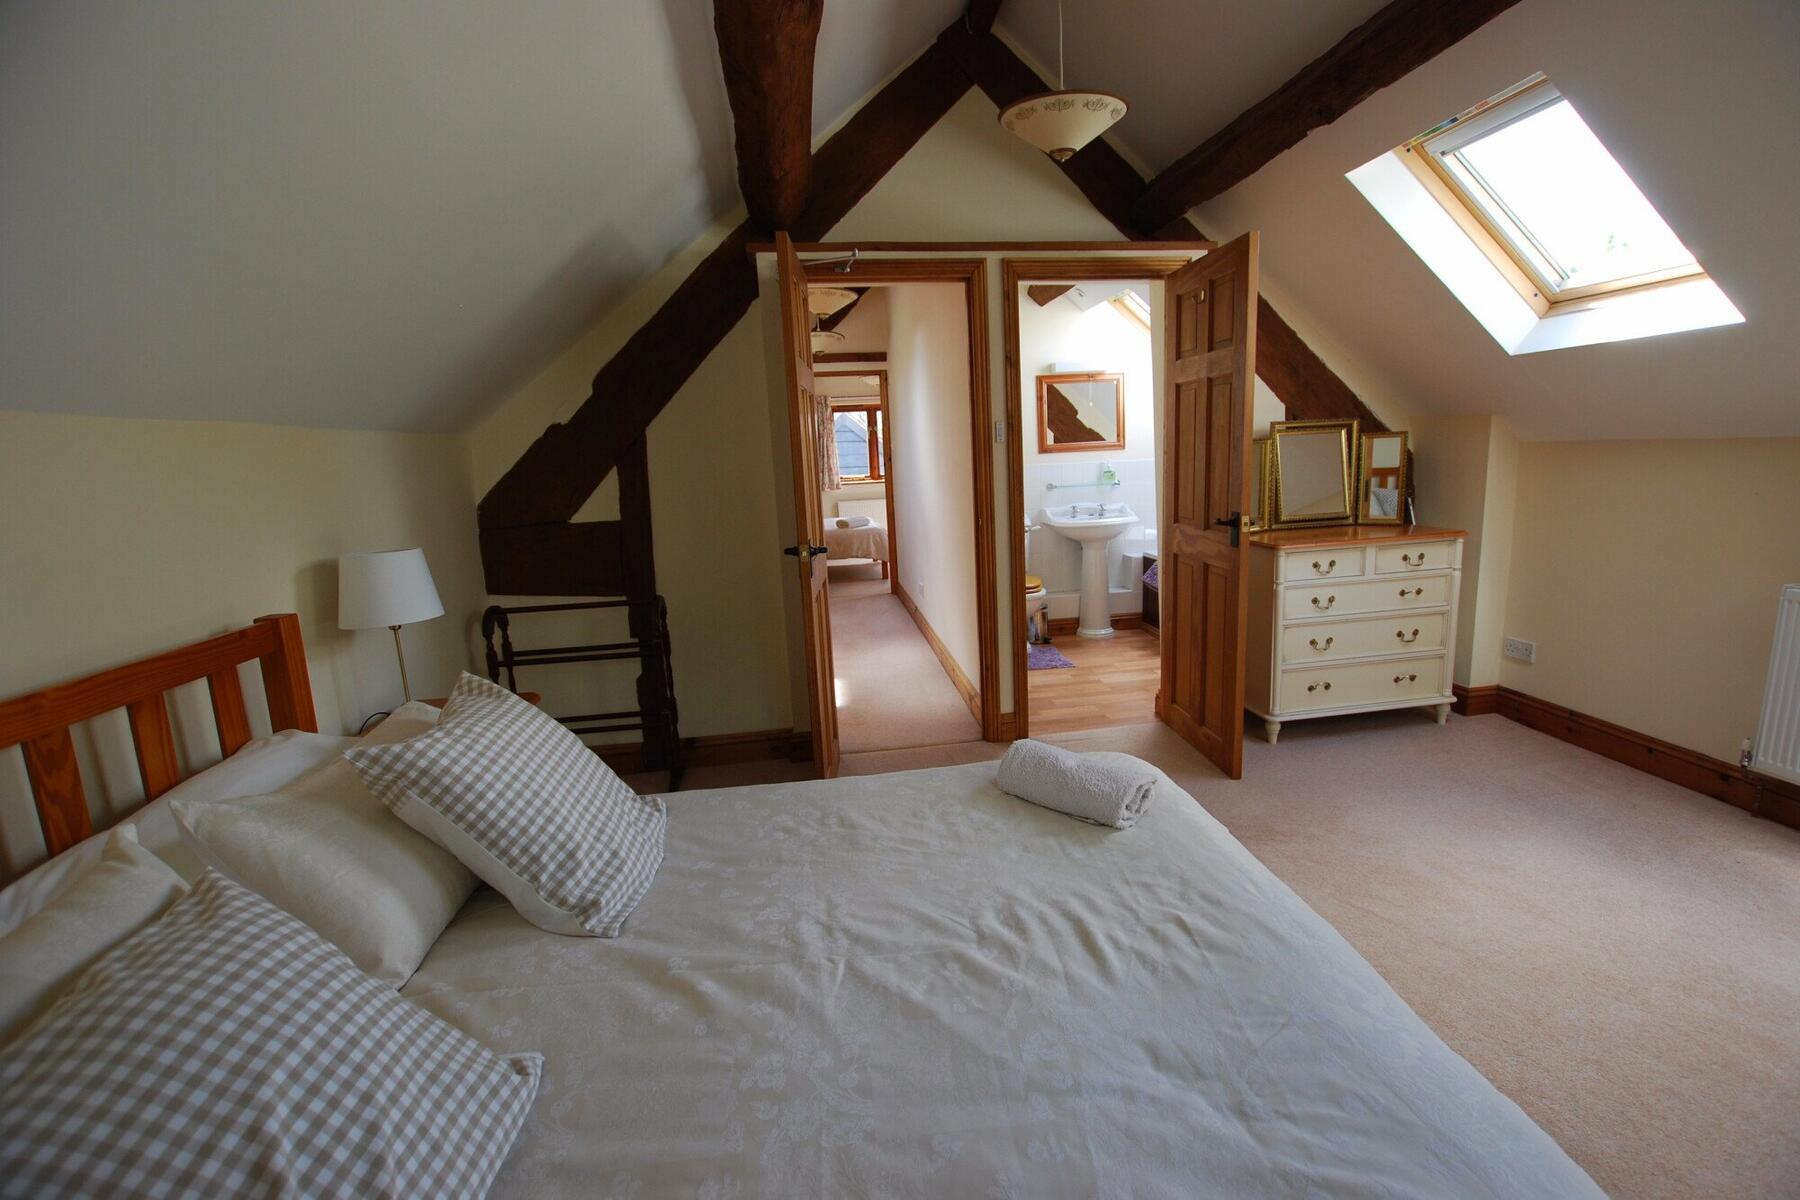 Byre, master bedroom